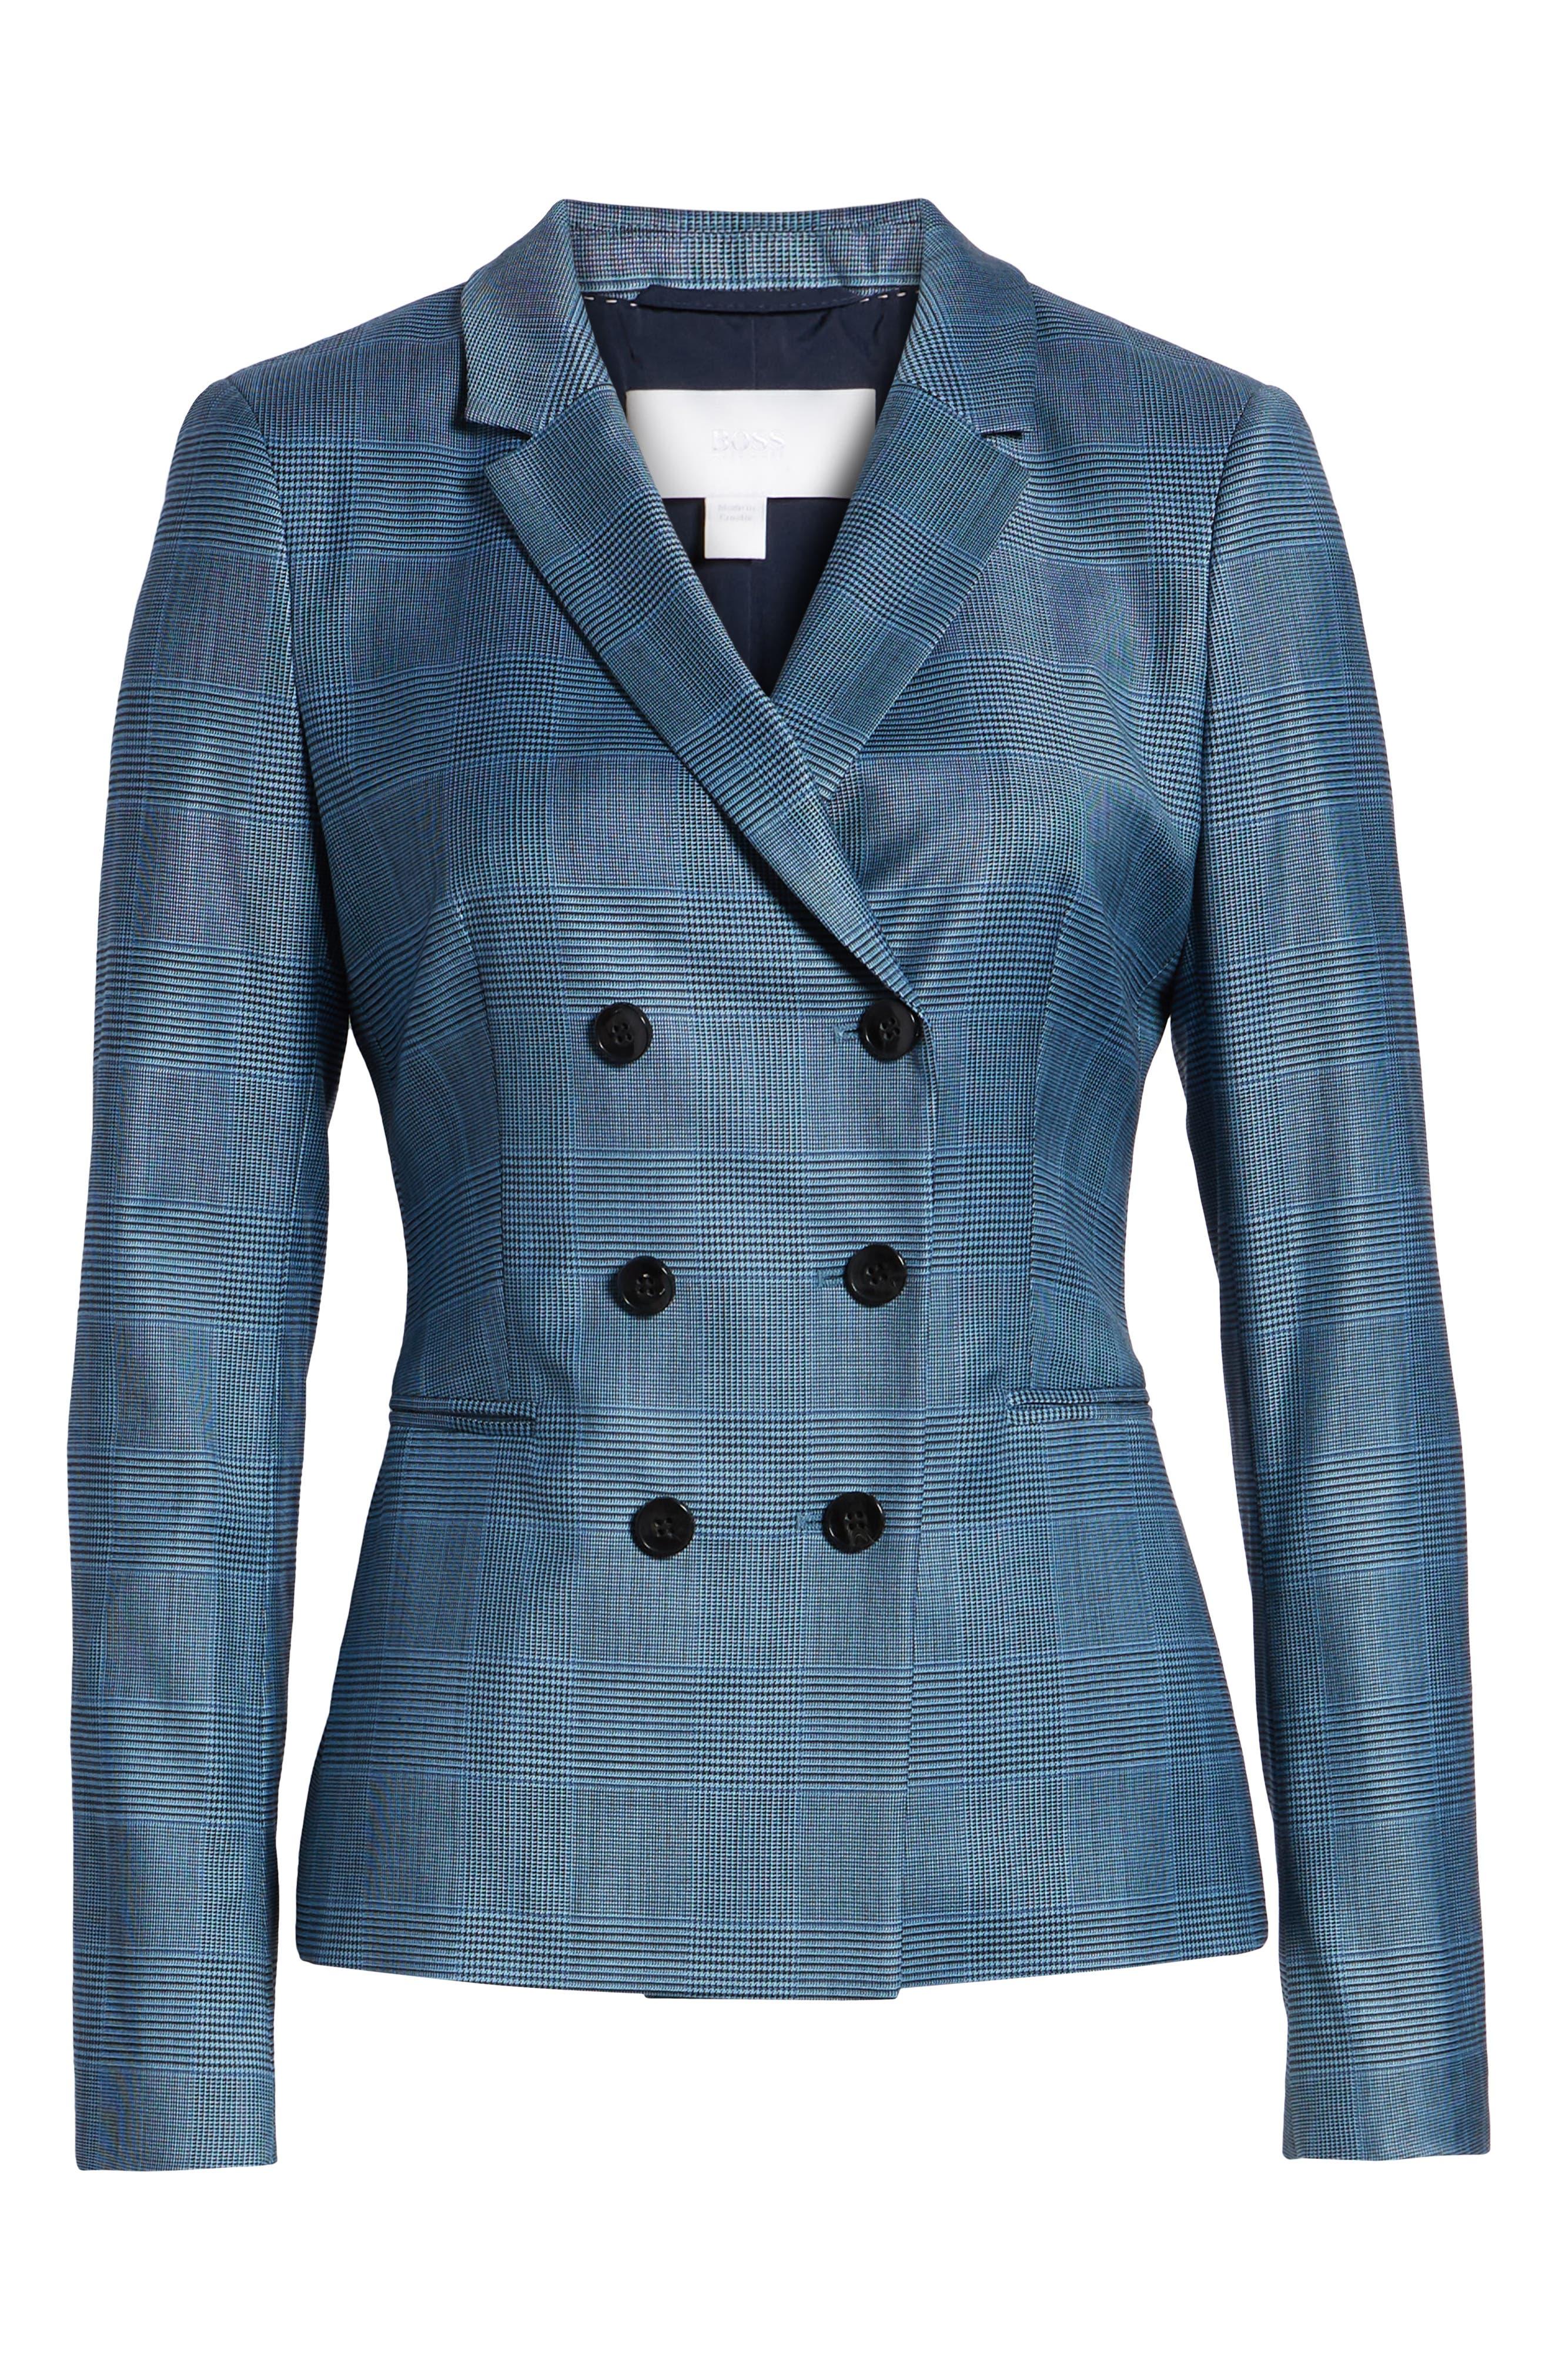 Jelaya Glencheck Double Breasted Suit Jacket,                             Alternate thumbnail 6, color,                             Sailor Blue Fantasy